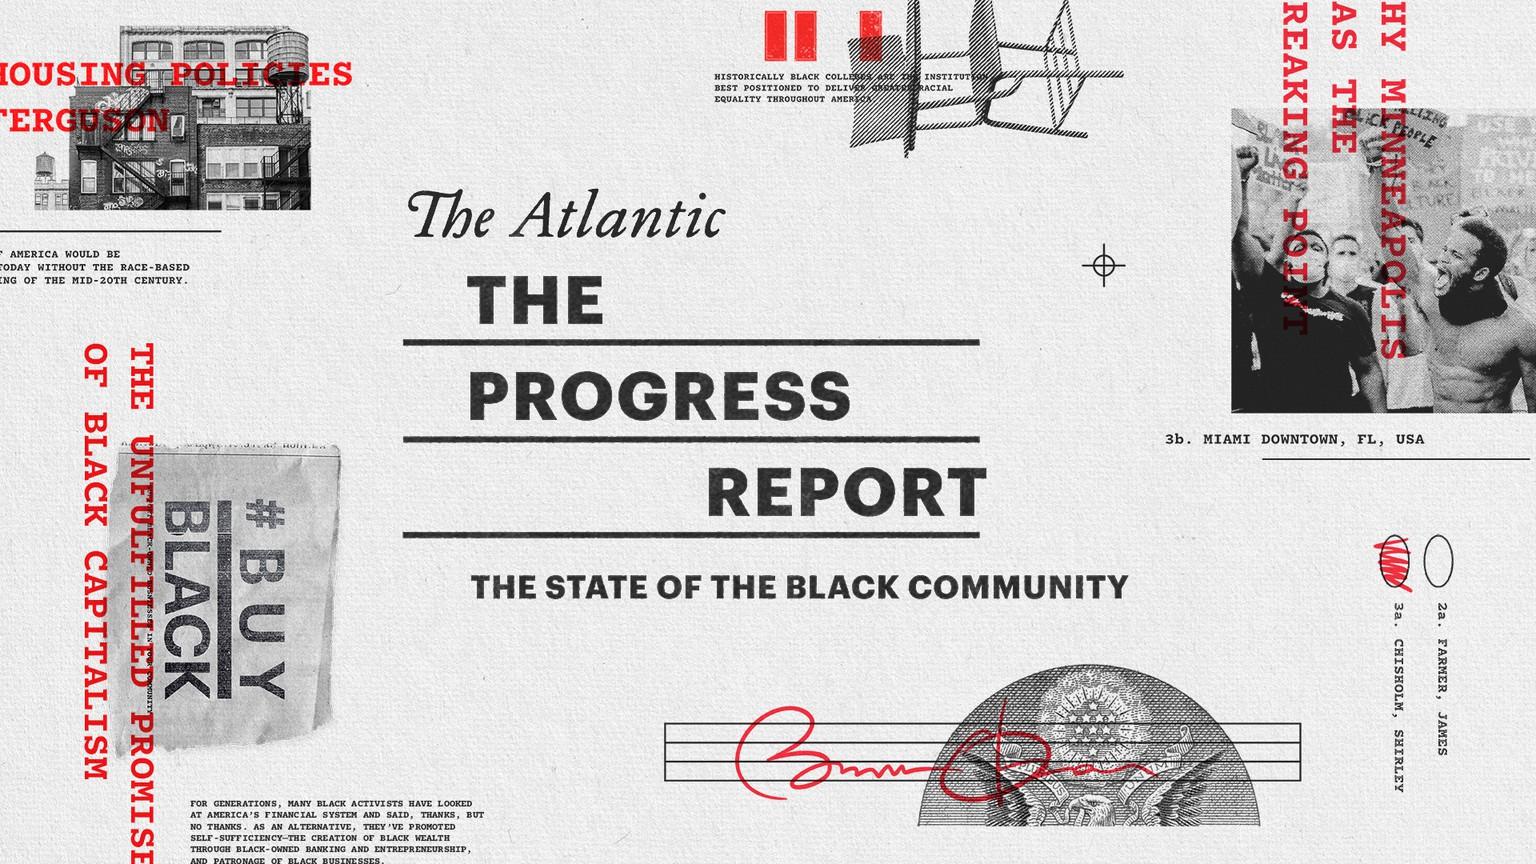 <i>The Atlantic</i>'s Progress Report: The State of the Black Community